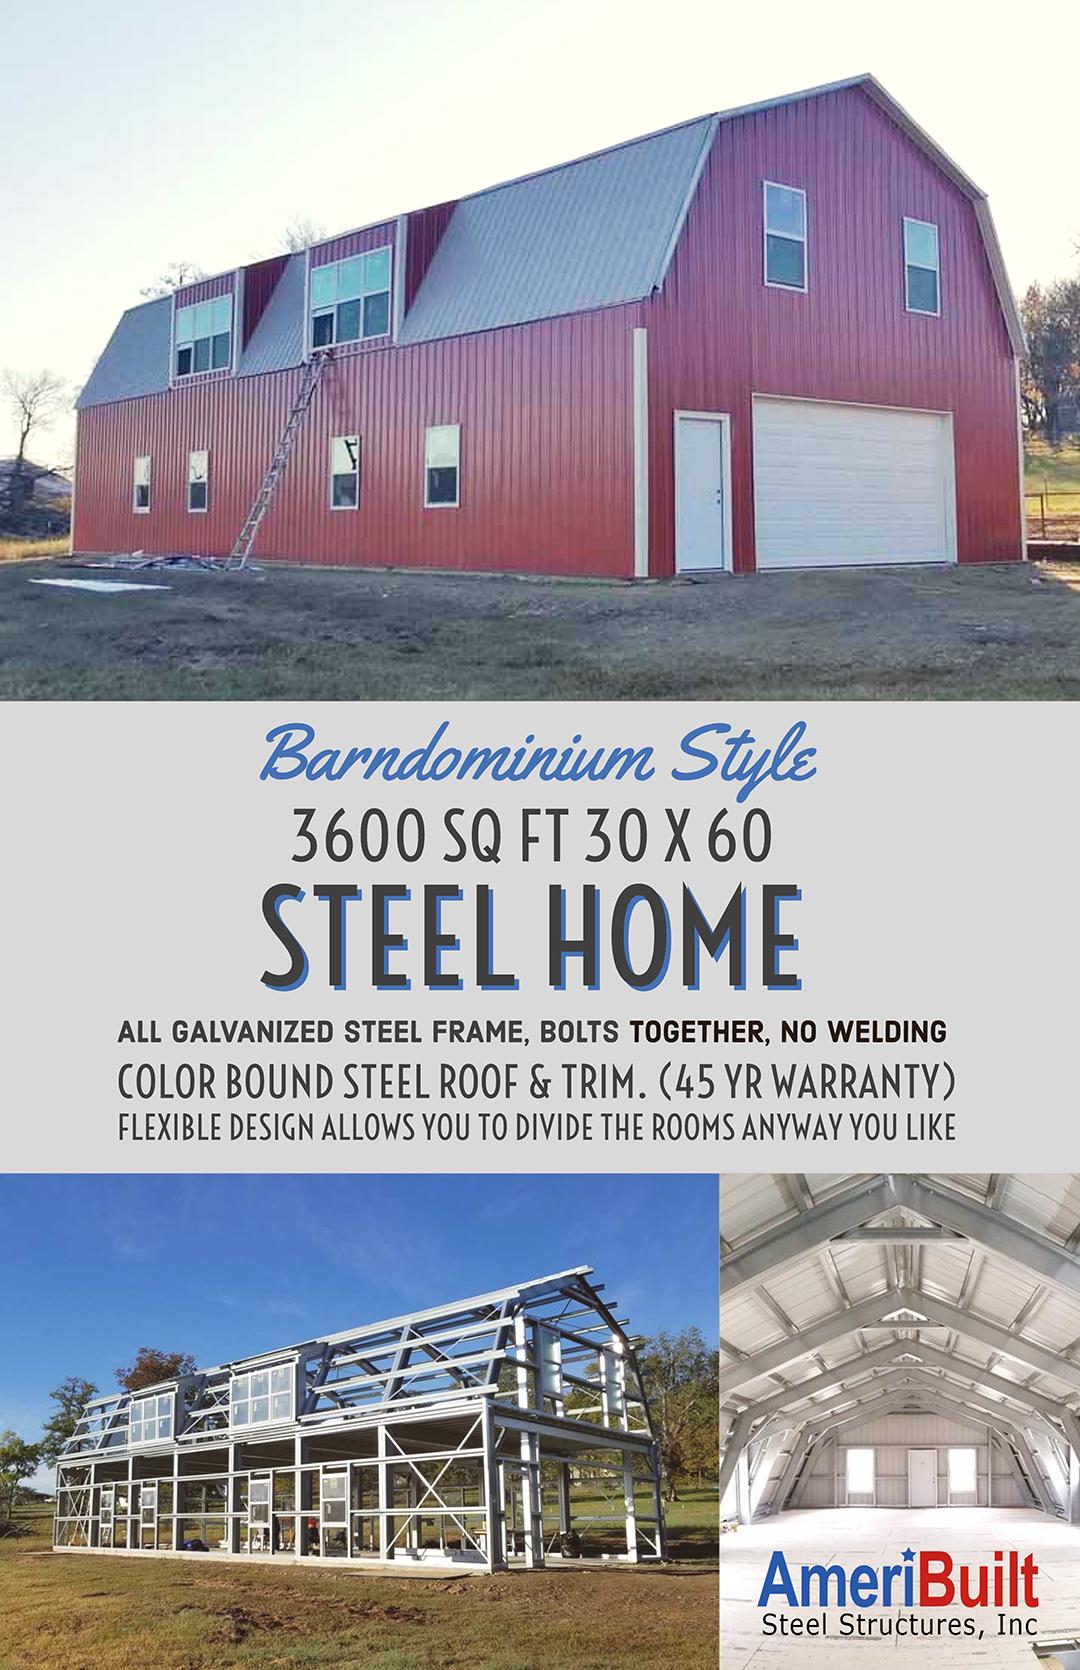 Steel Homes And Barndominiums By Ameribuilt Steel Metal Building Kits Metal Building Kits Prices Steel House